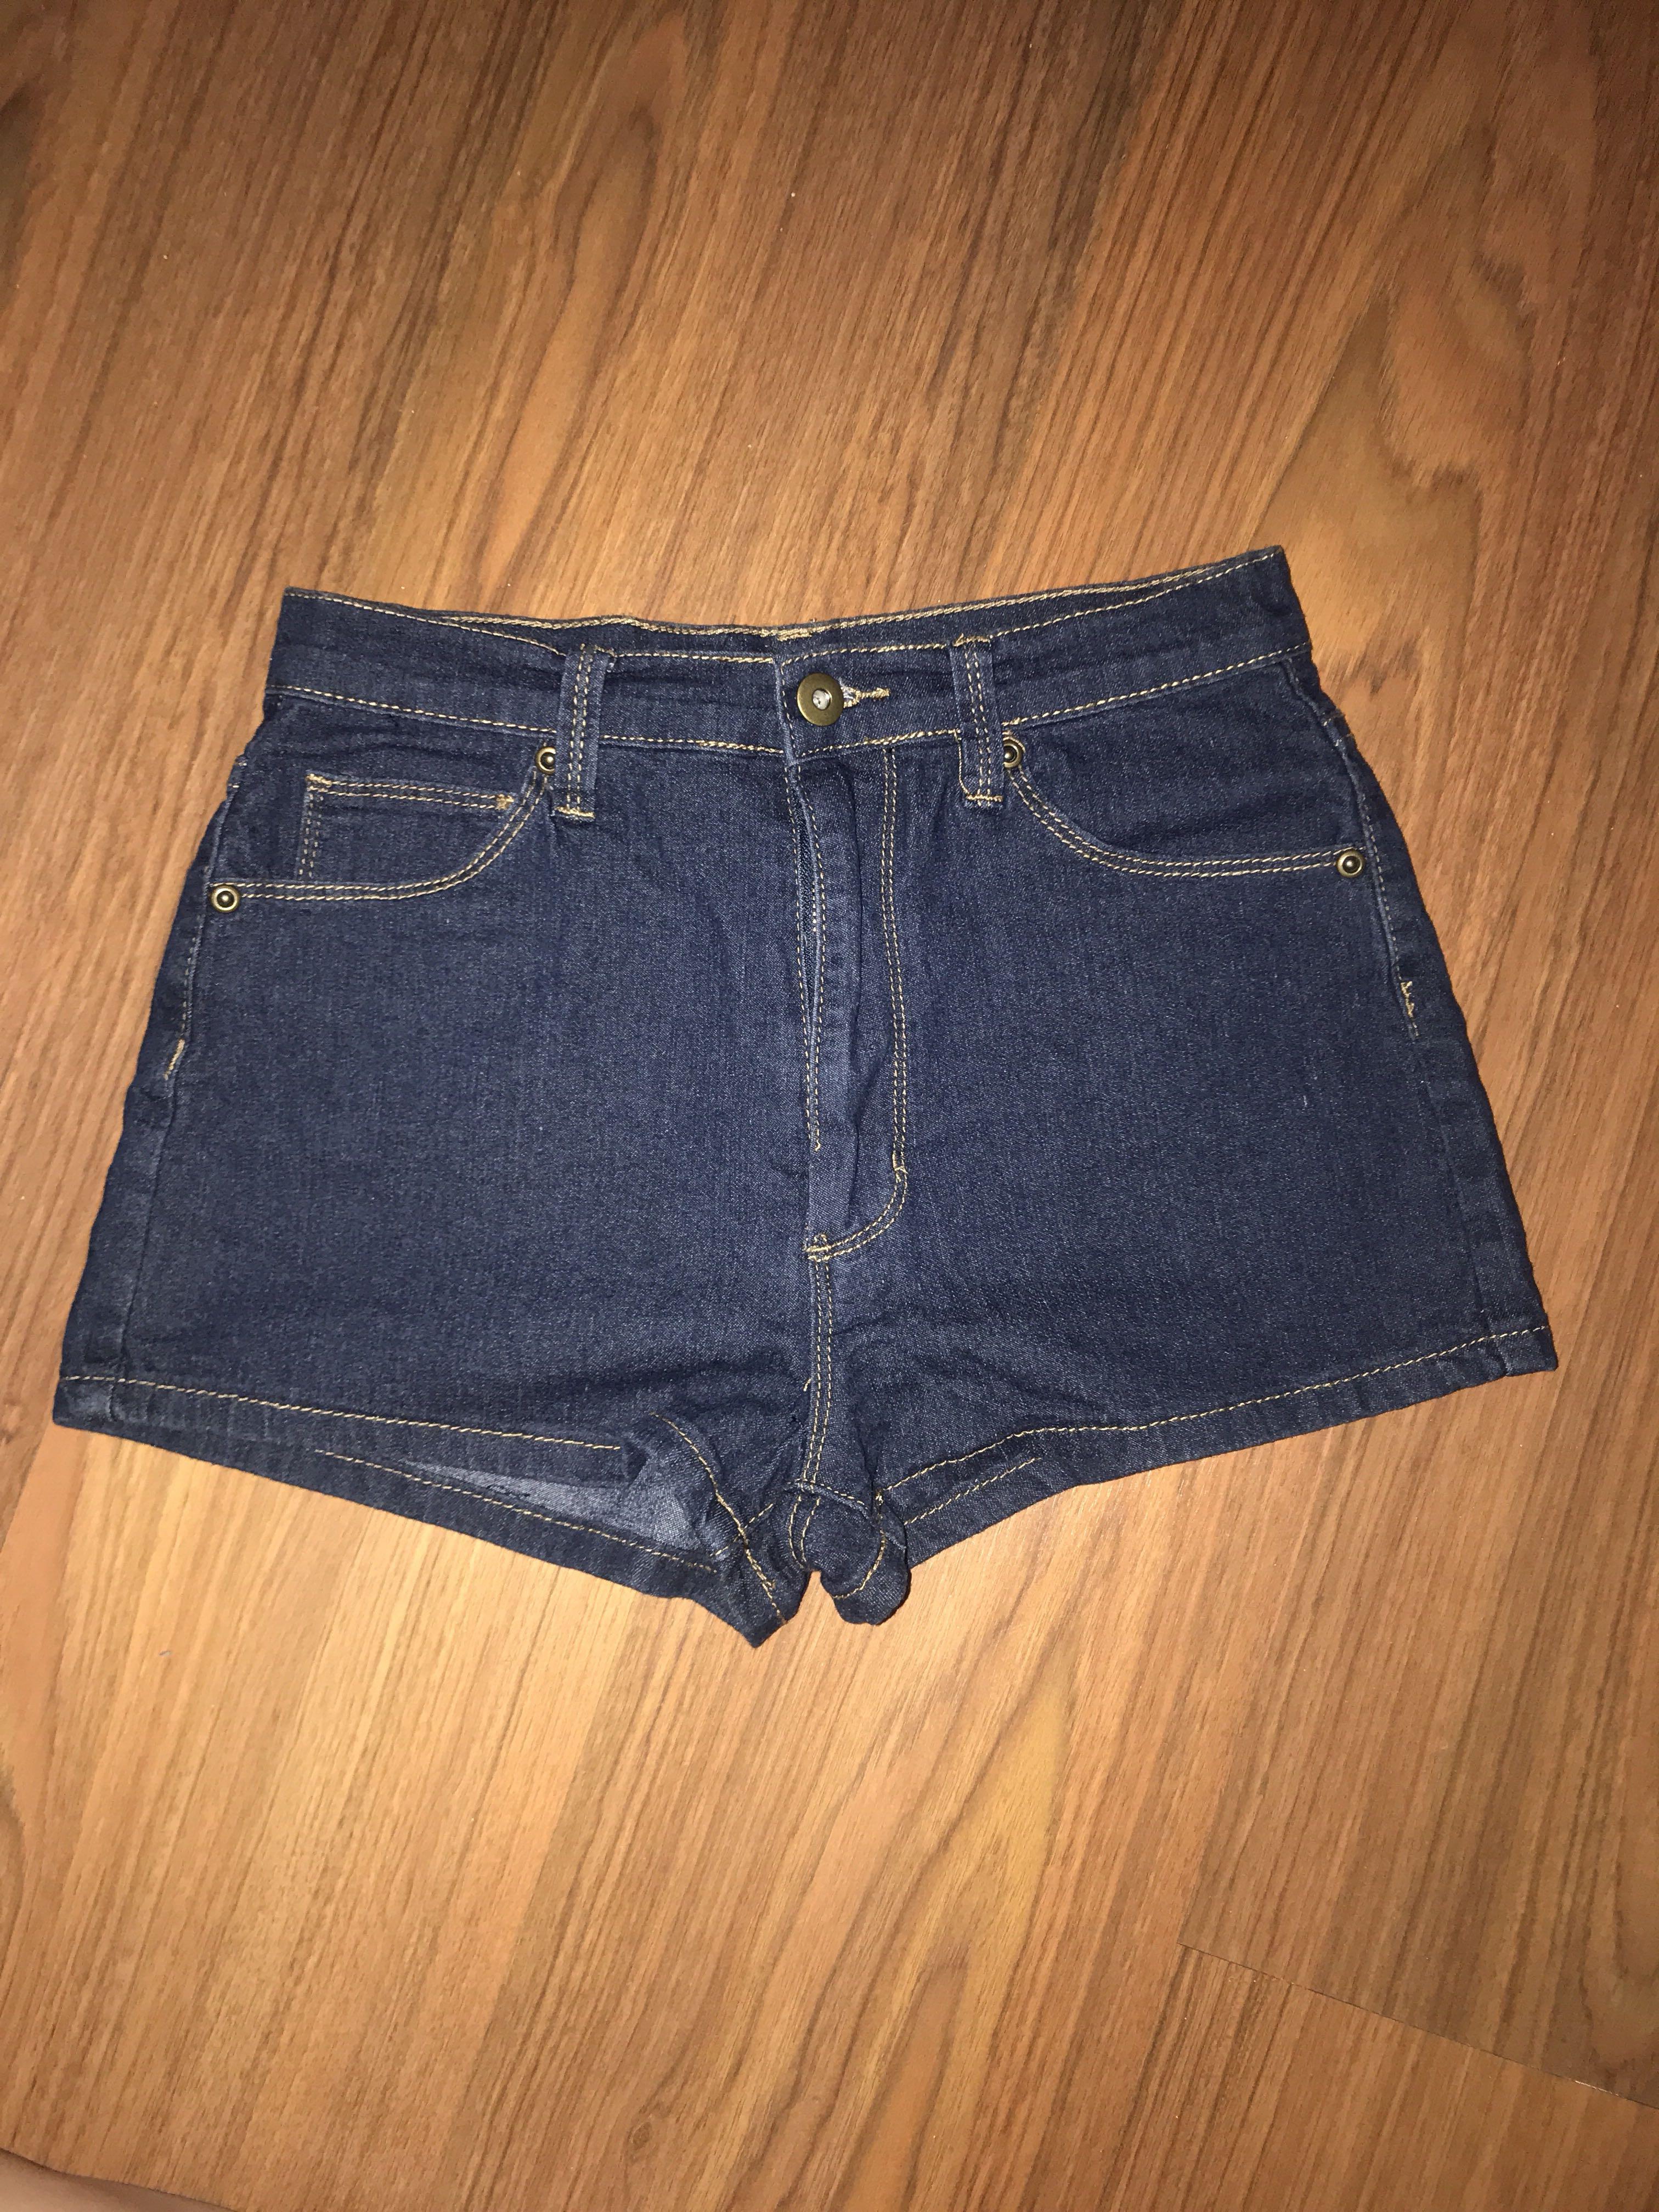 F21 high waist jeans denim